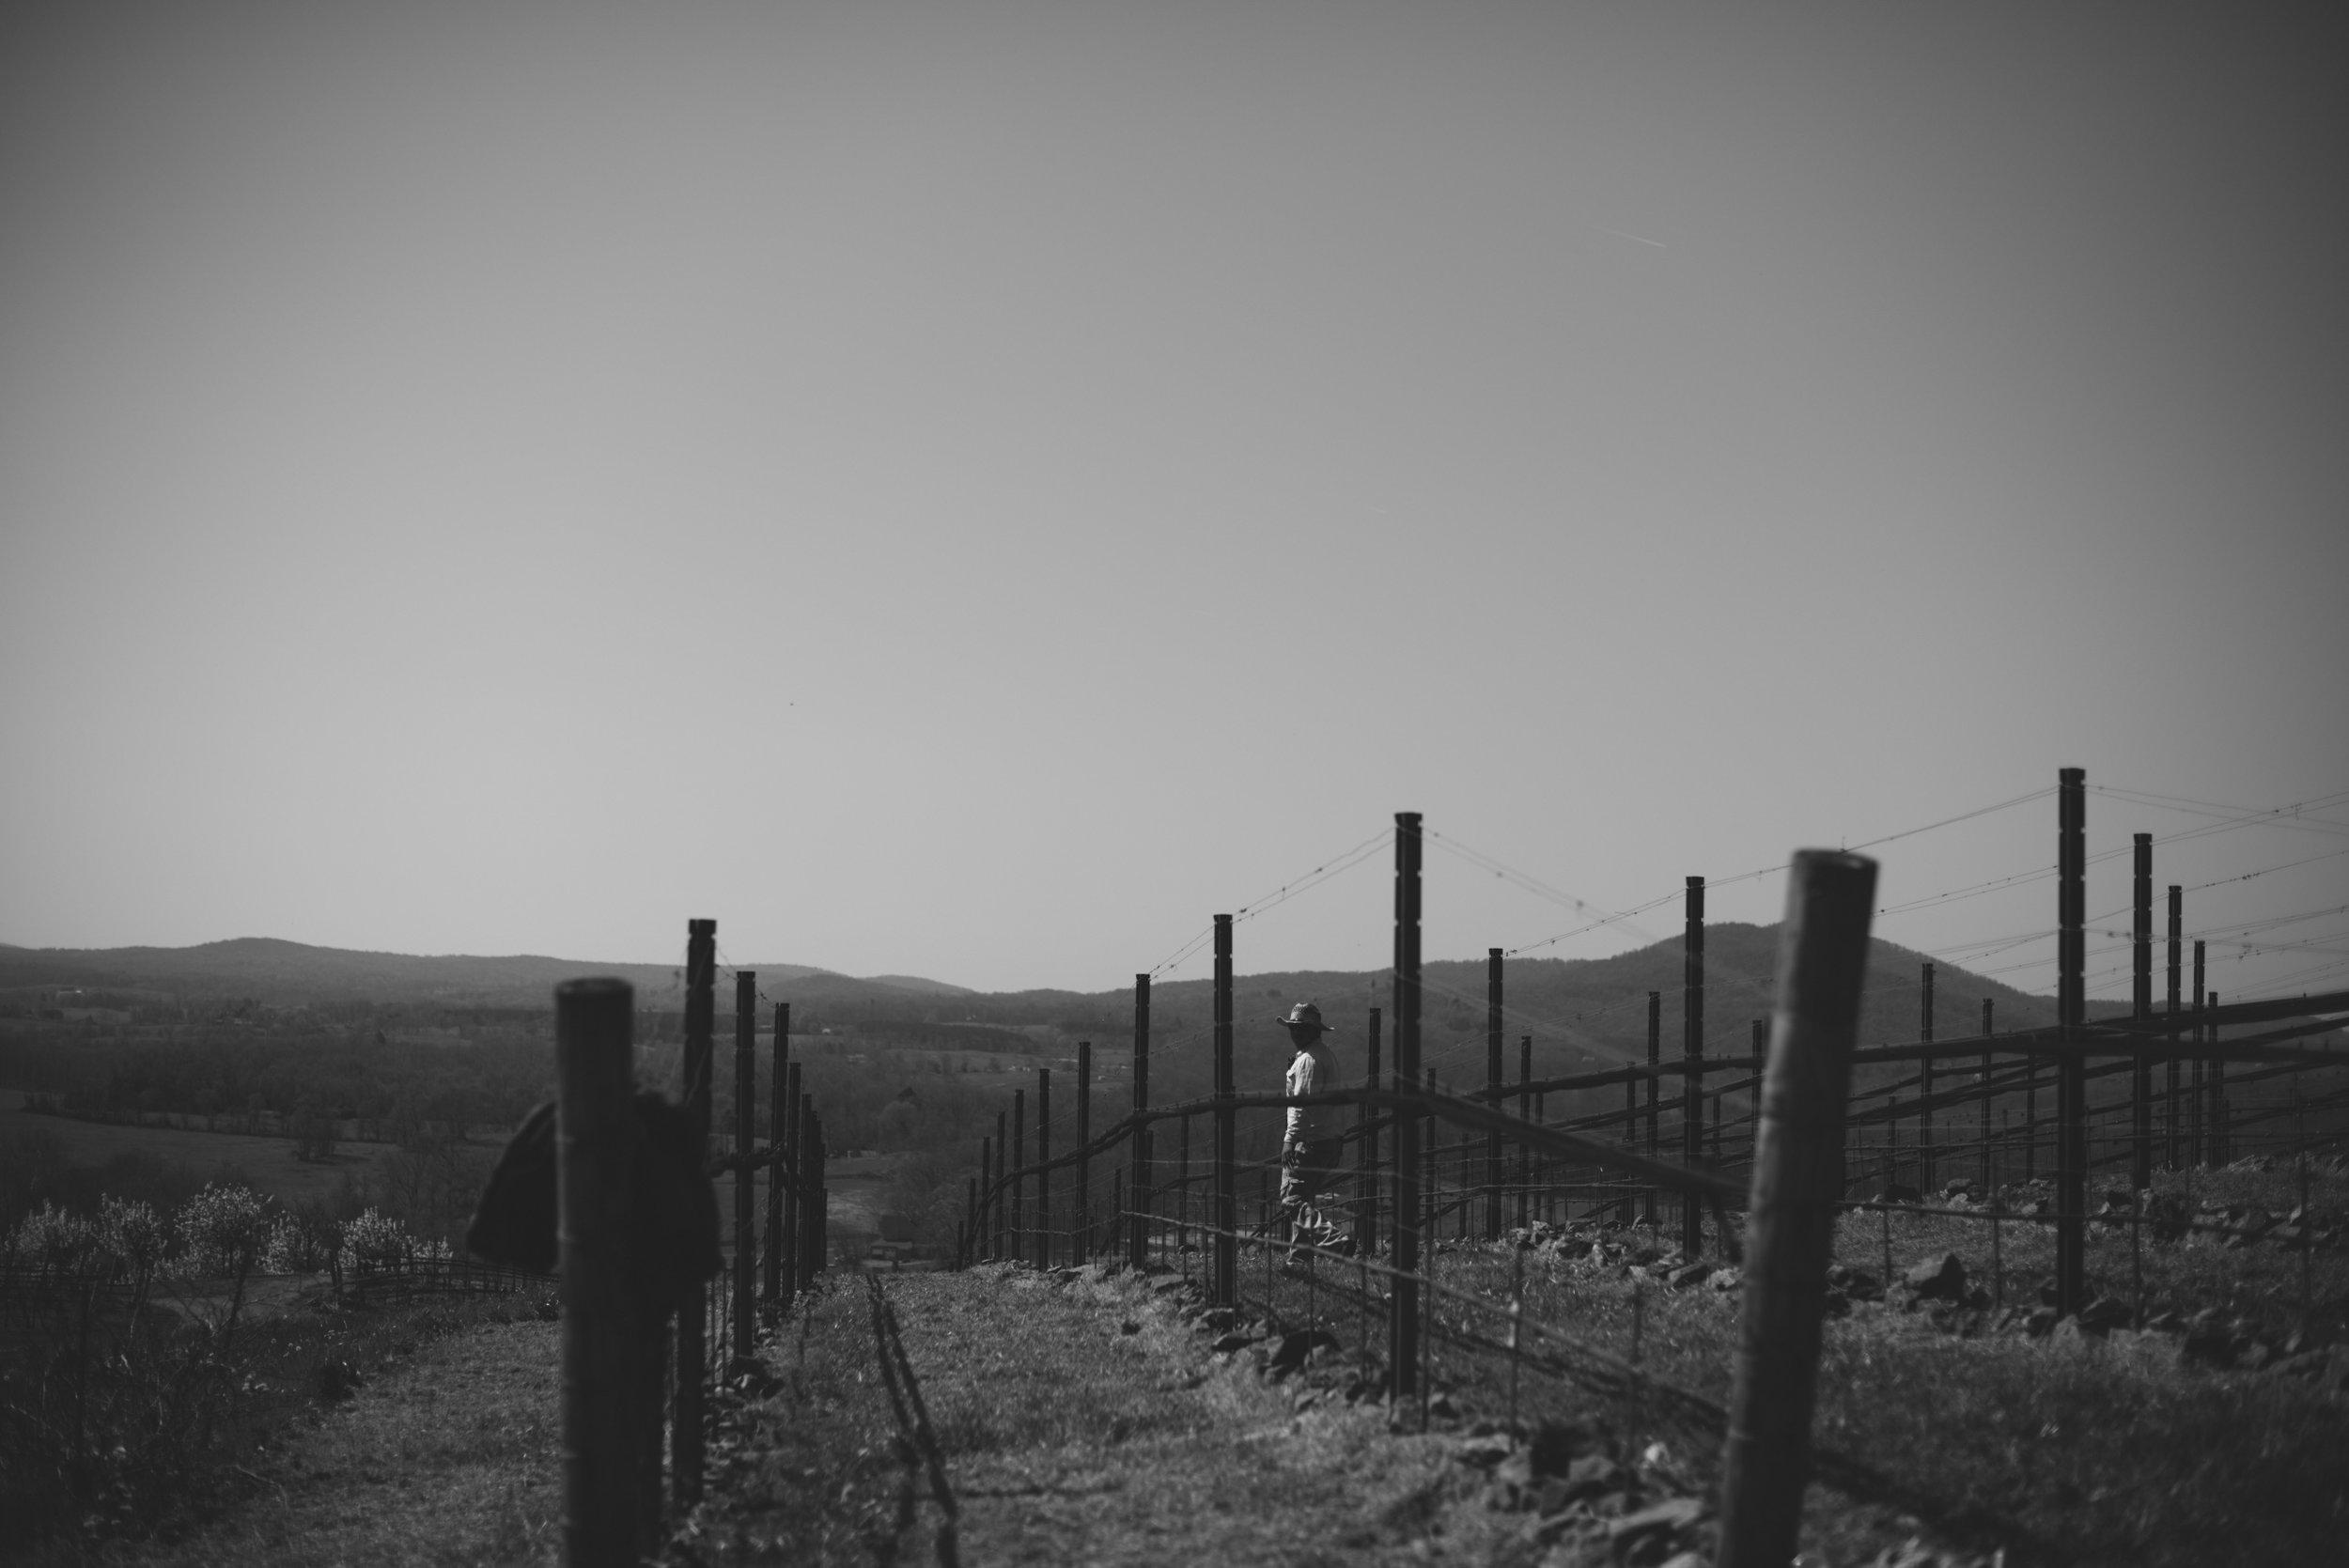 2013 Vintage Film RdV Vineyards